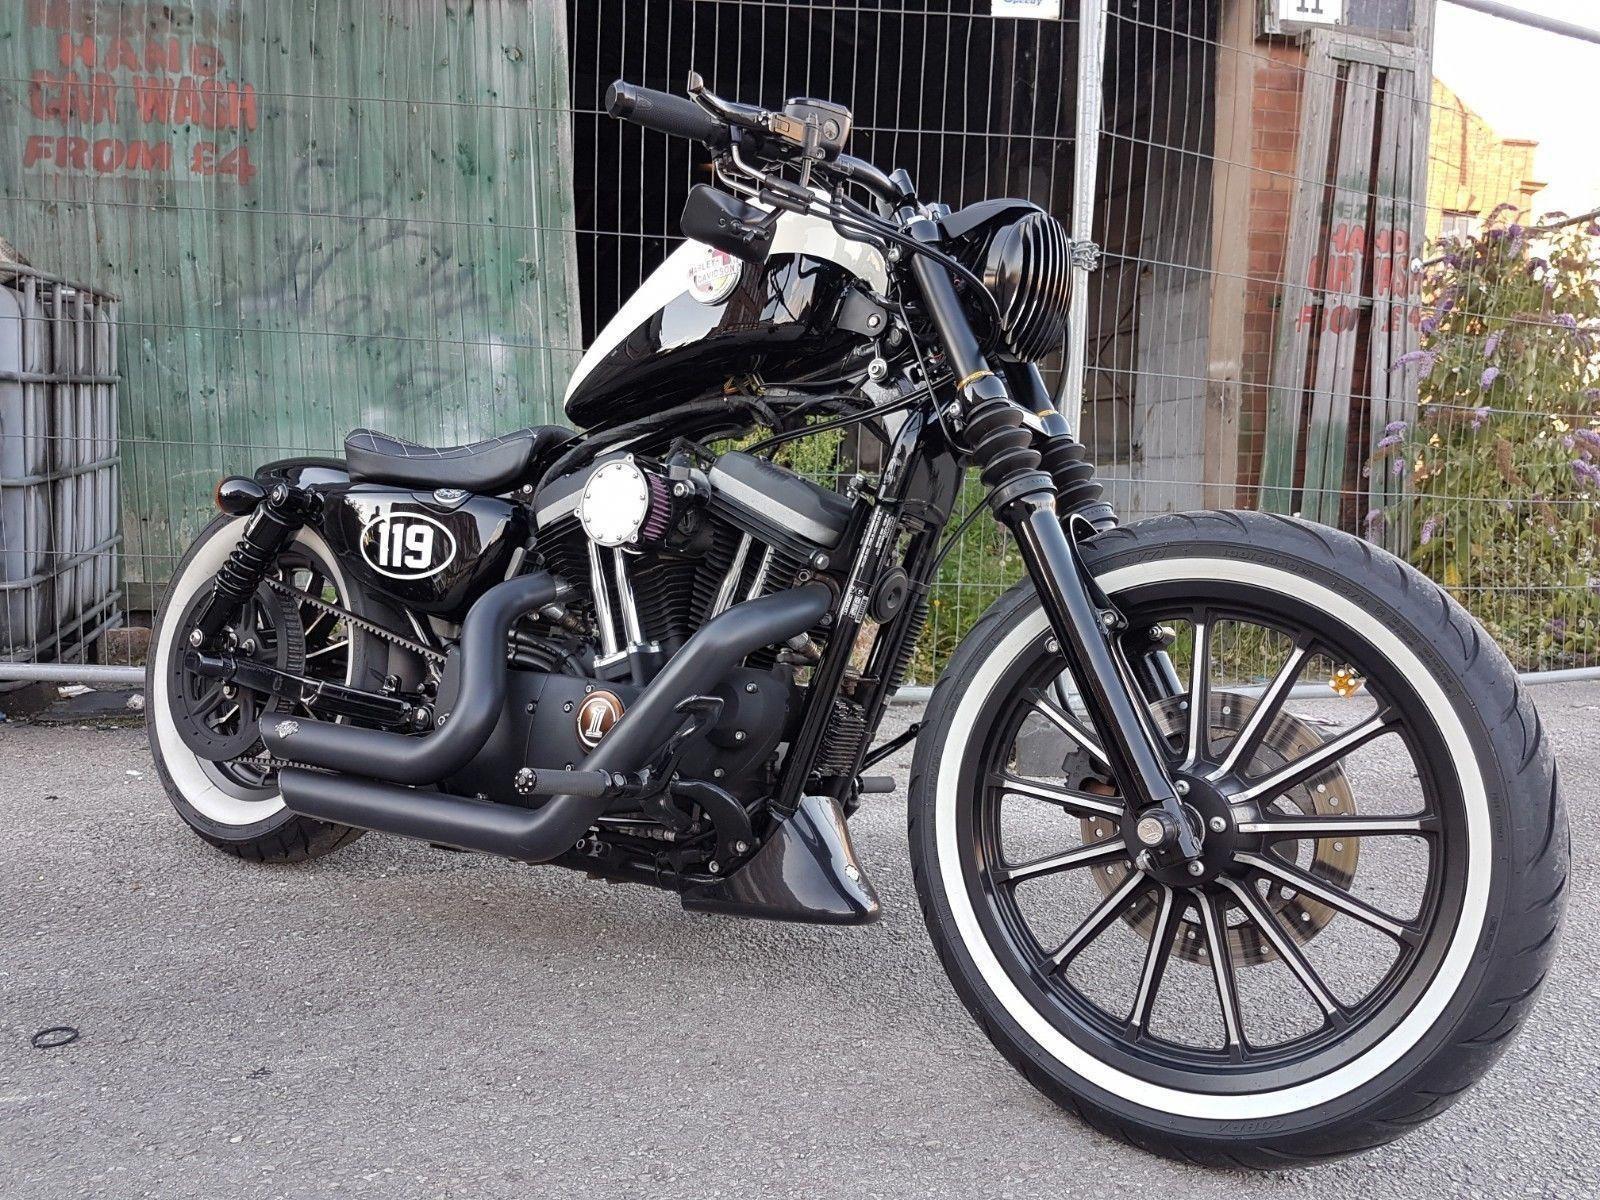 Harley Davidson Custom Bobber For Sale Uk Harleydavidsoncustom